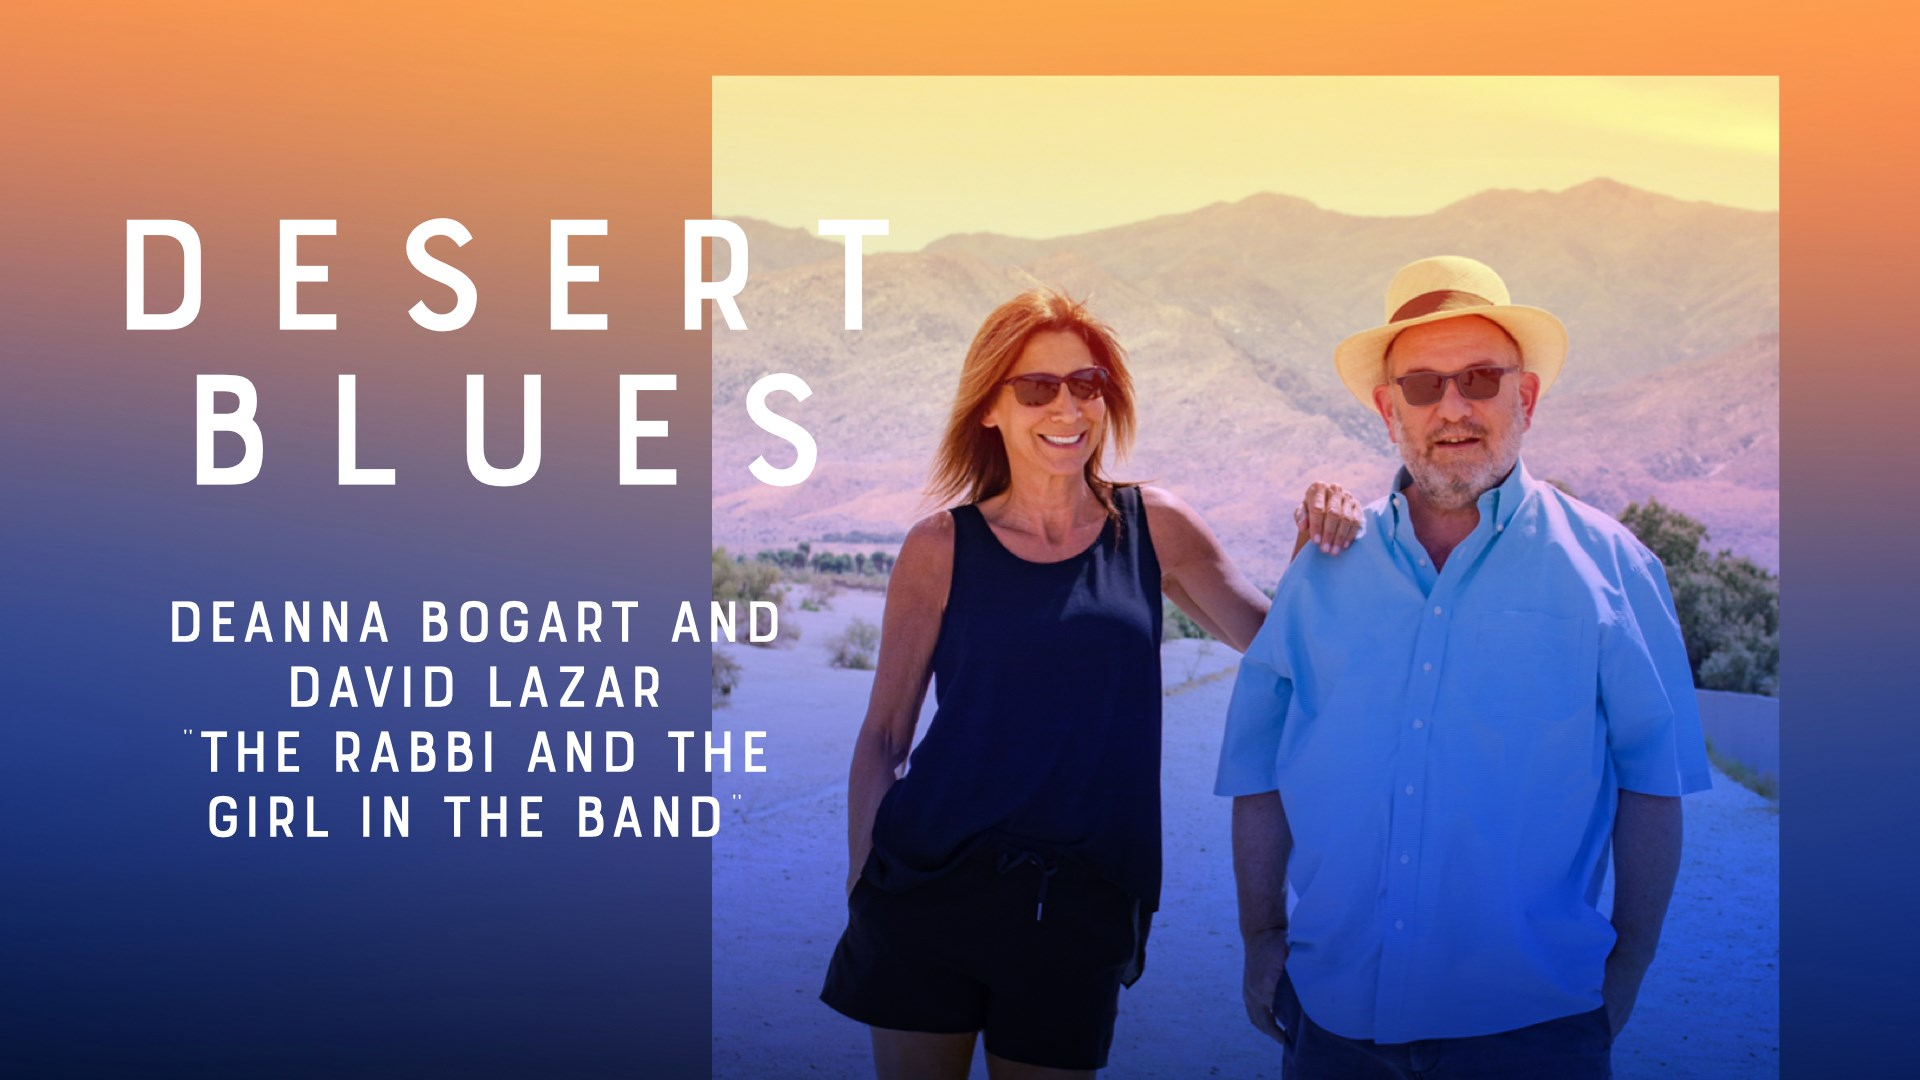 Desert Blues Concert Palm Springs - Deanna Bogart - - Or Hamidbar - Rabbi David Lazar - Synagogue Palm Springs Jewish Community